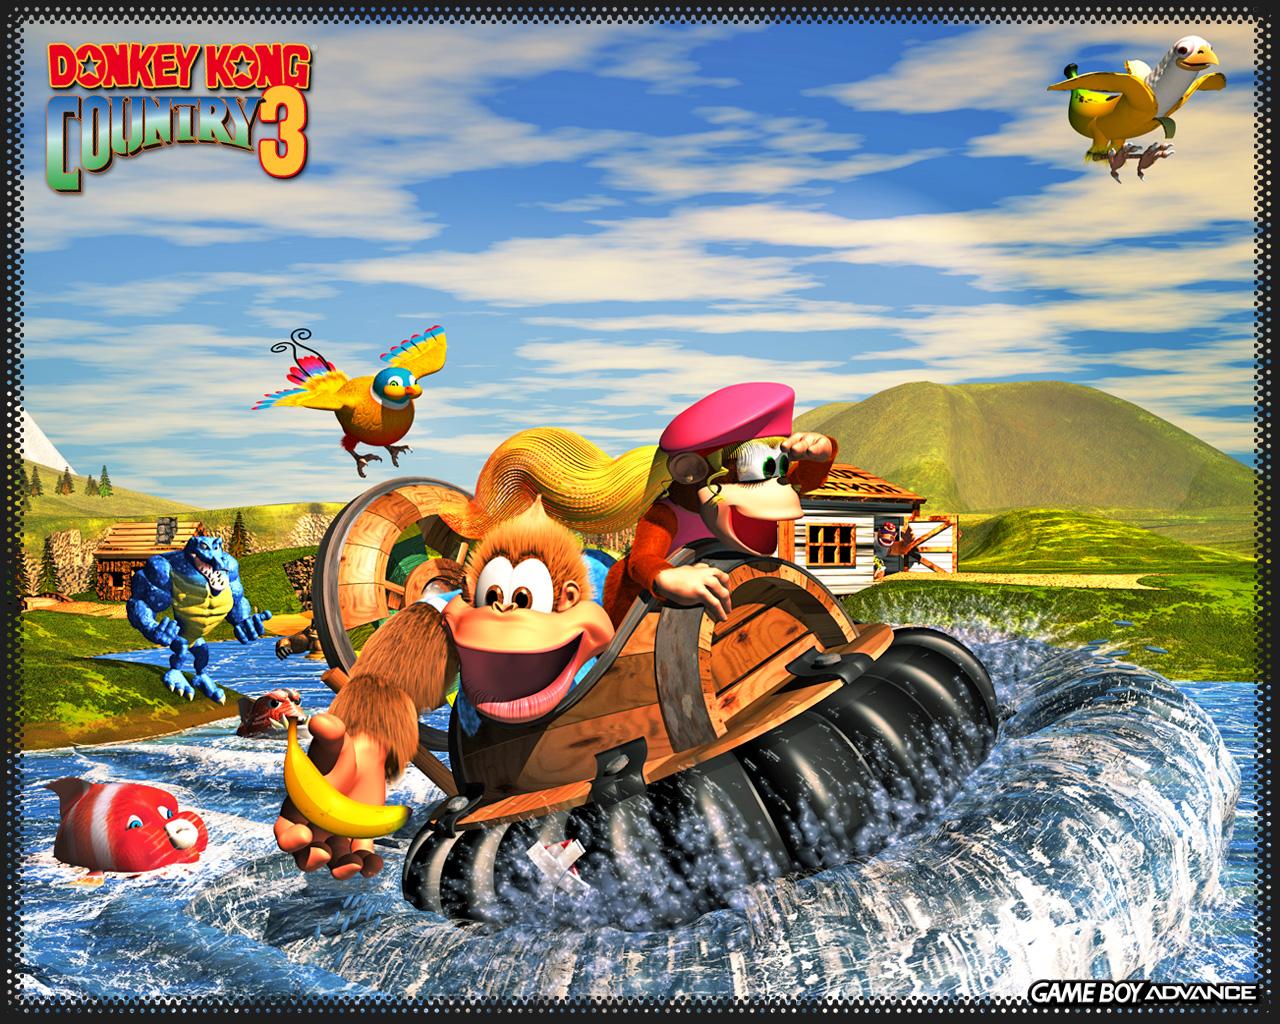 Donkey Kong Country 3 llega el 2 de Junio al 3DS